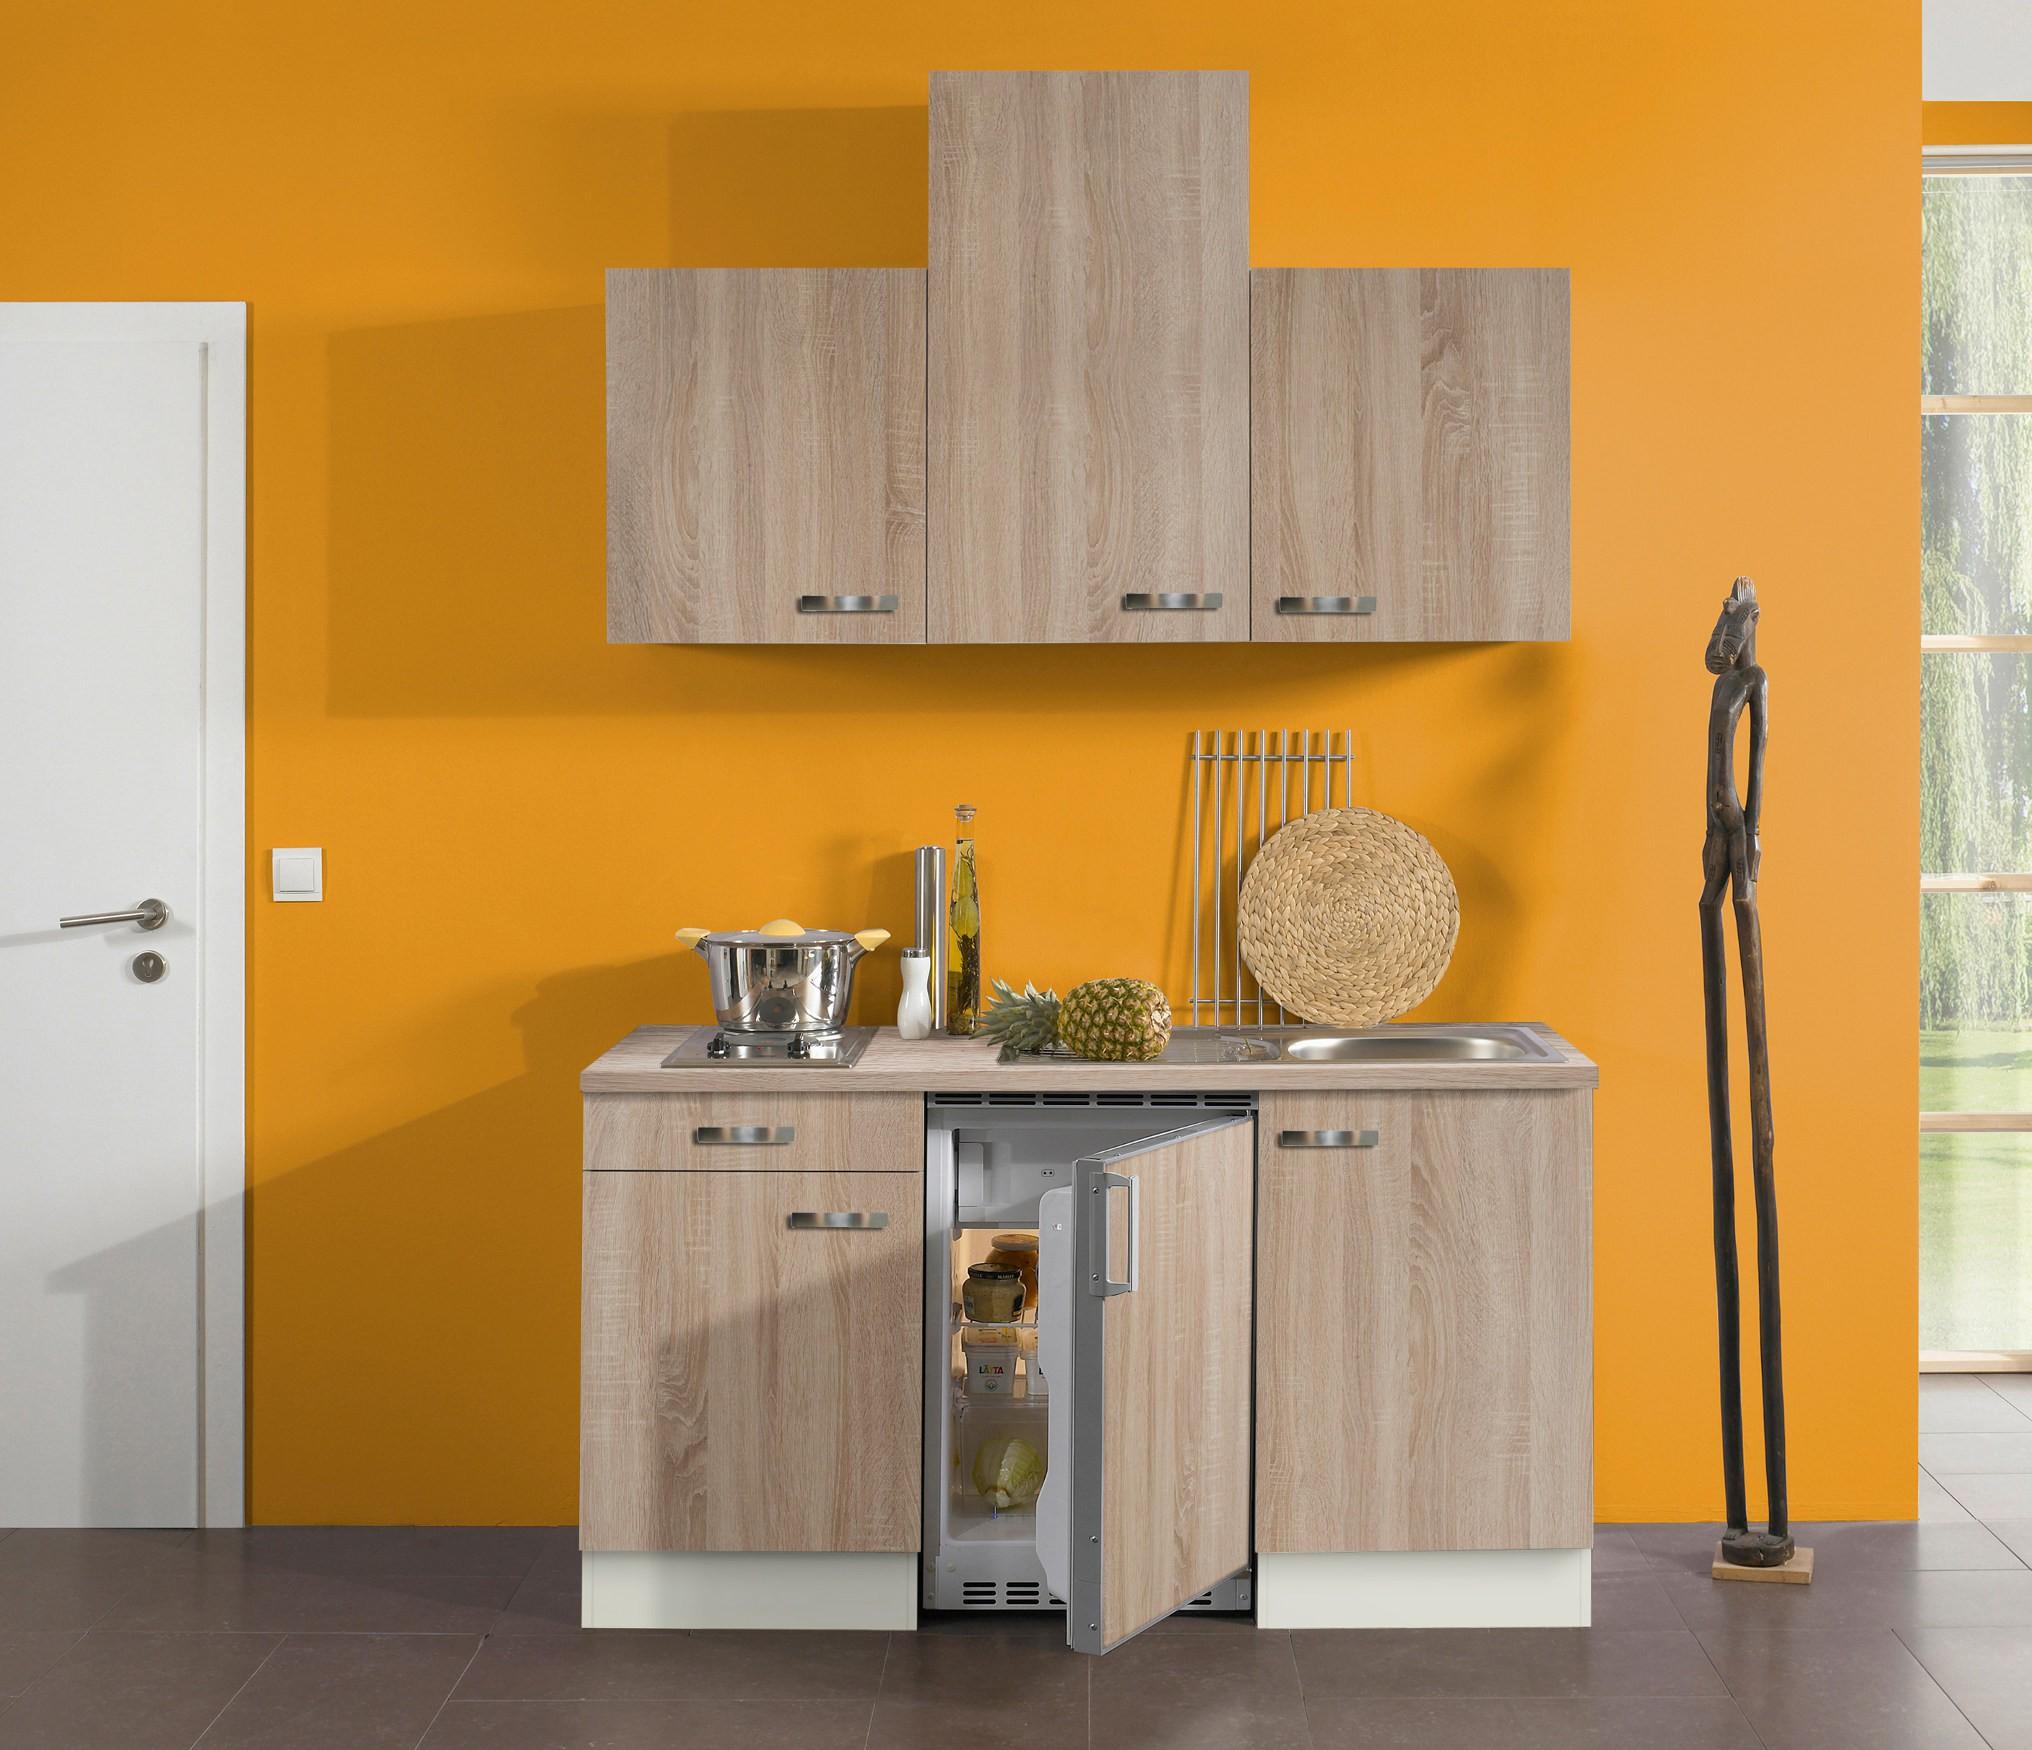 singlek che toledo vario 2 mit elektro kochfeld. Black Bedroom Furniture Sets. Home Design Ideas